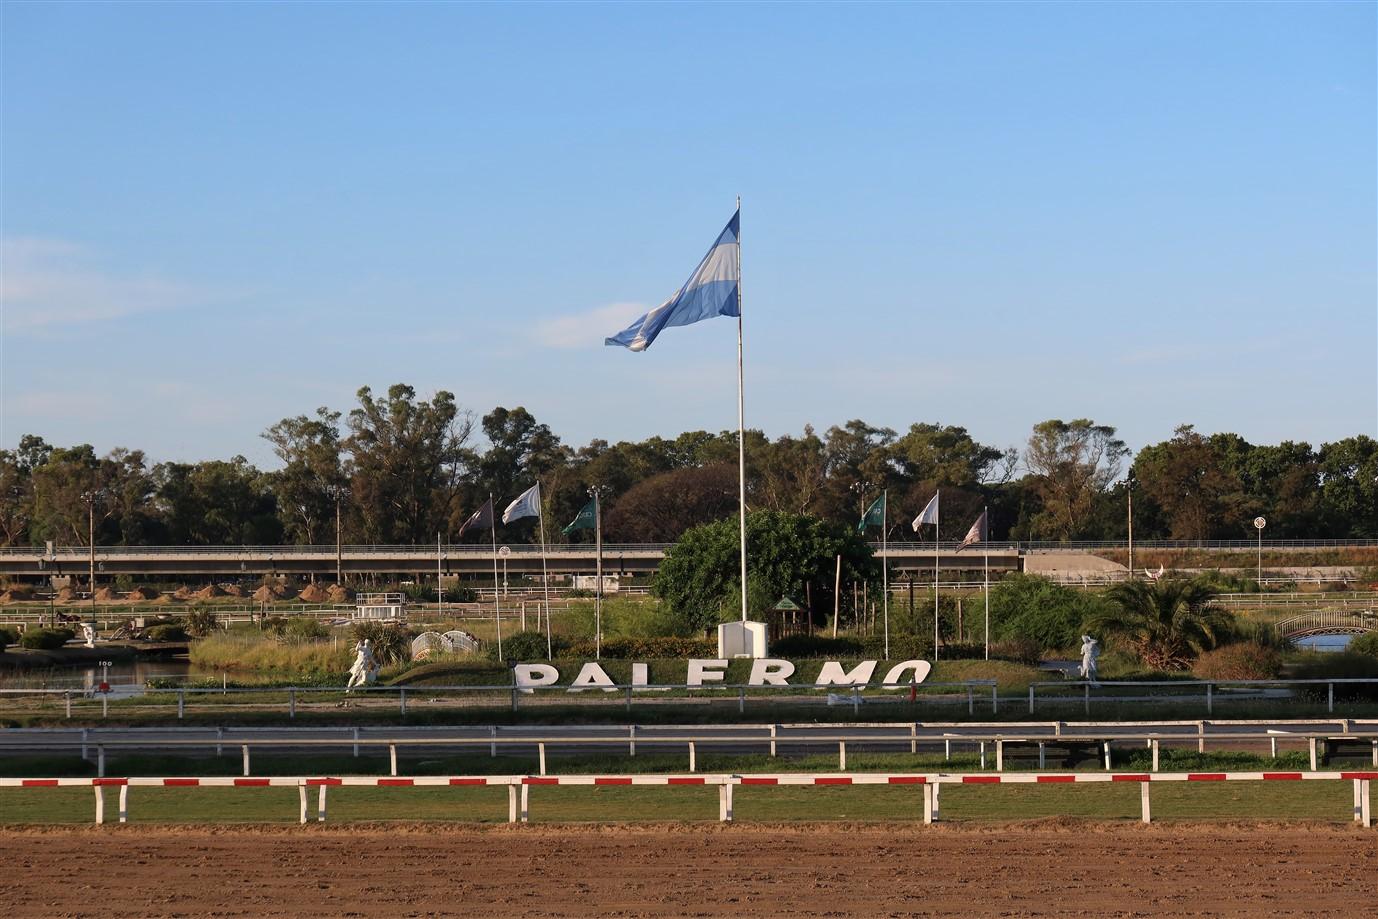 2020 03 07 312 Buenos Aires Hippodromo Palermo.jpg